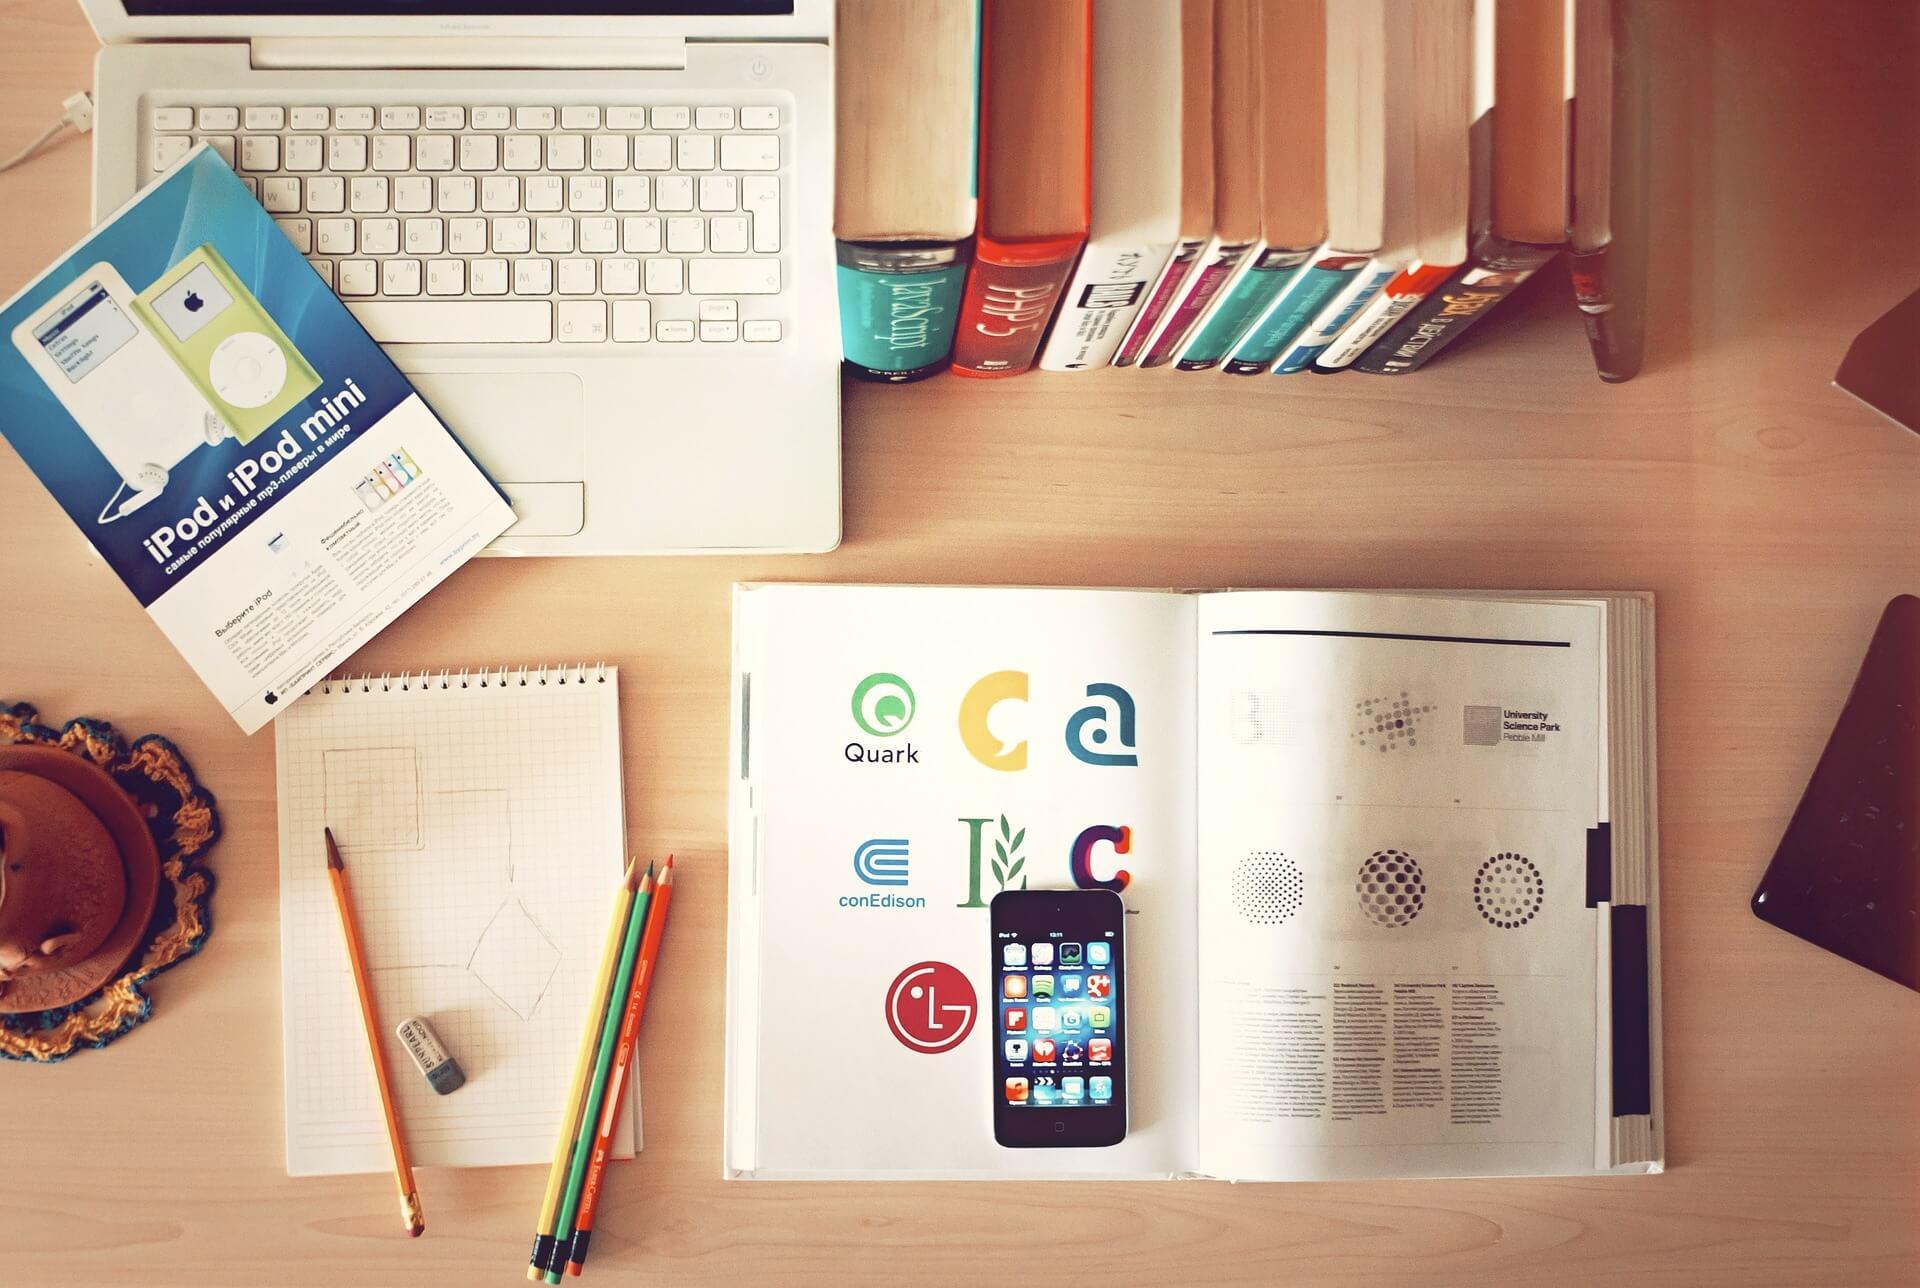 Auszubildender - Ausbildung heißt Planung